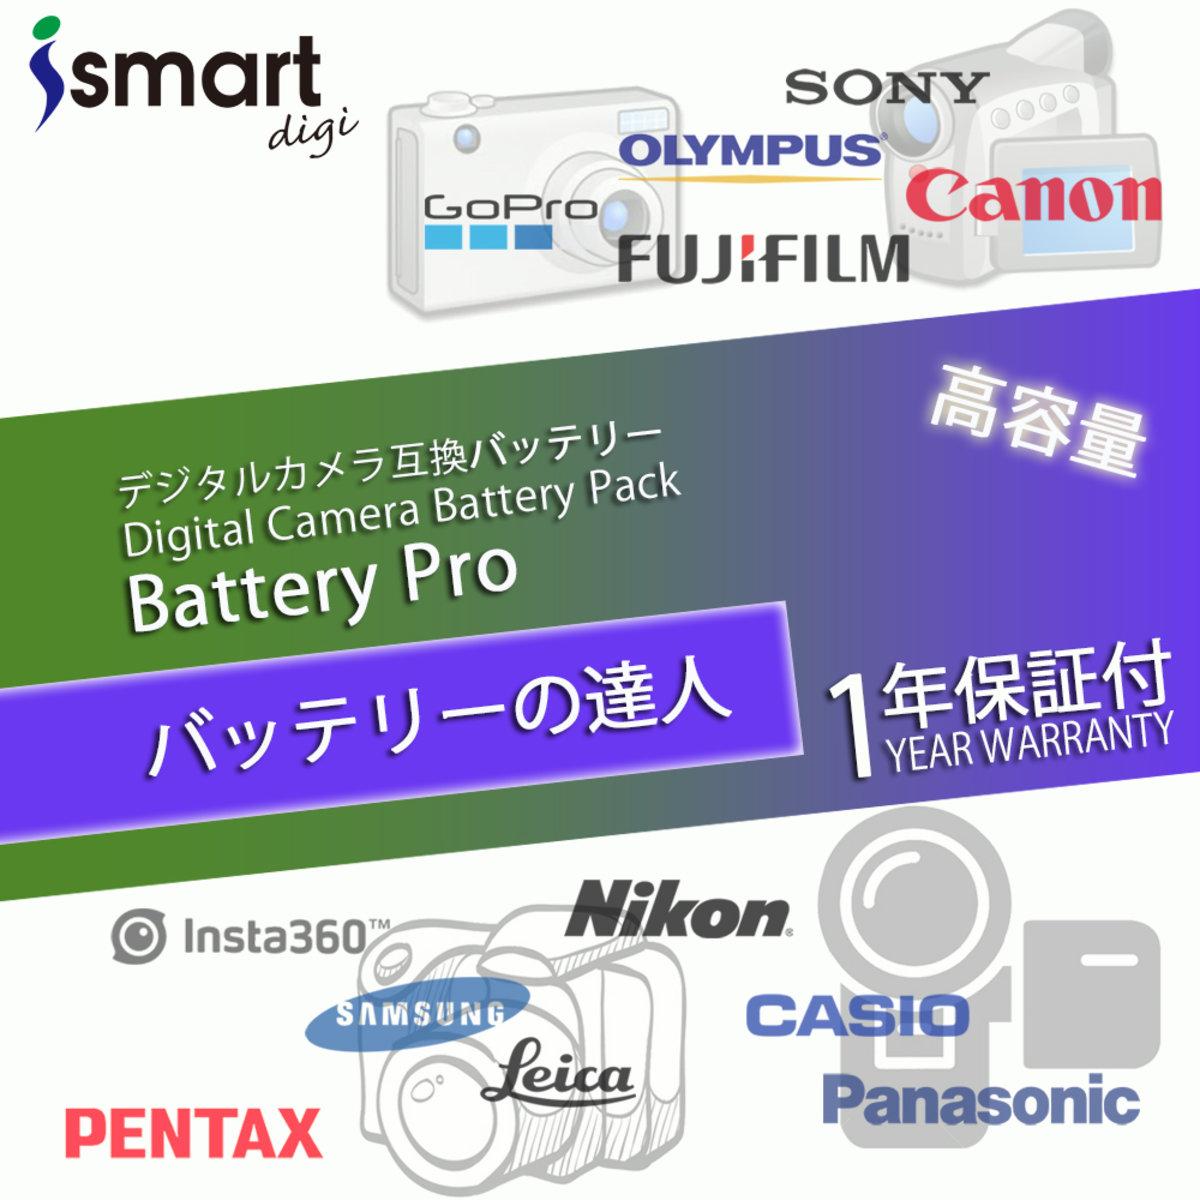 Panasonic Digital Camera Battery (For:DMC-FX10, DMC-FX100, DMC-FX12, DMC-FX3, DMC-FX50)